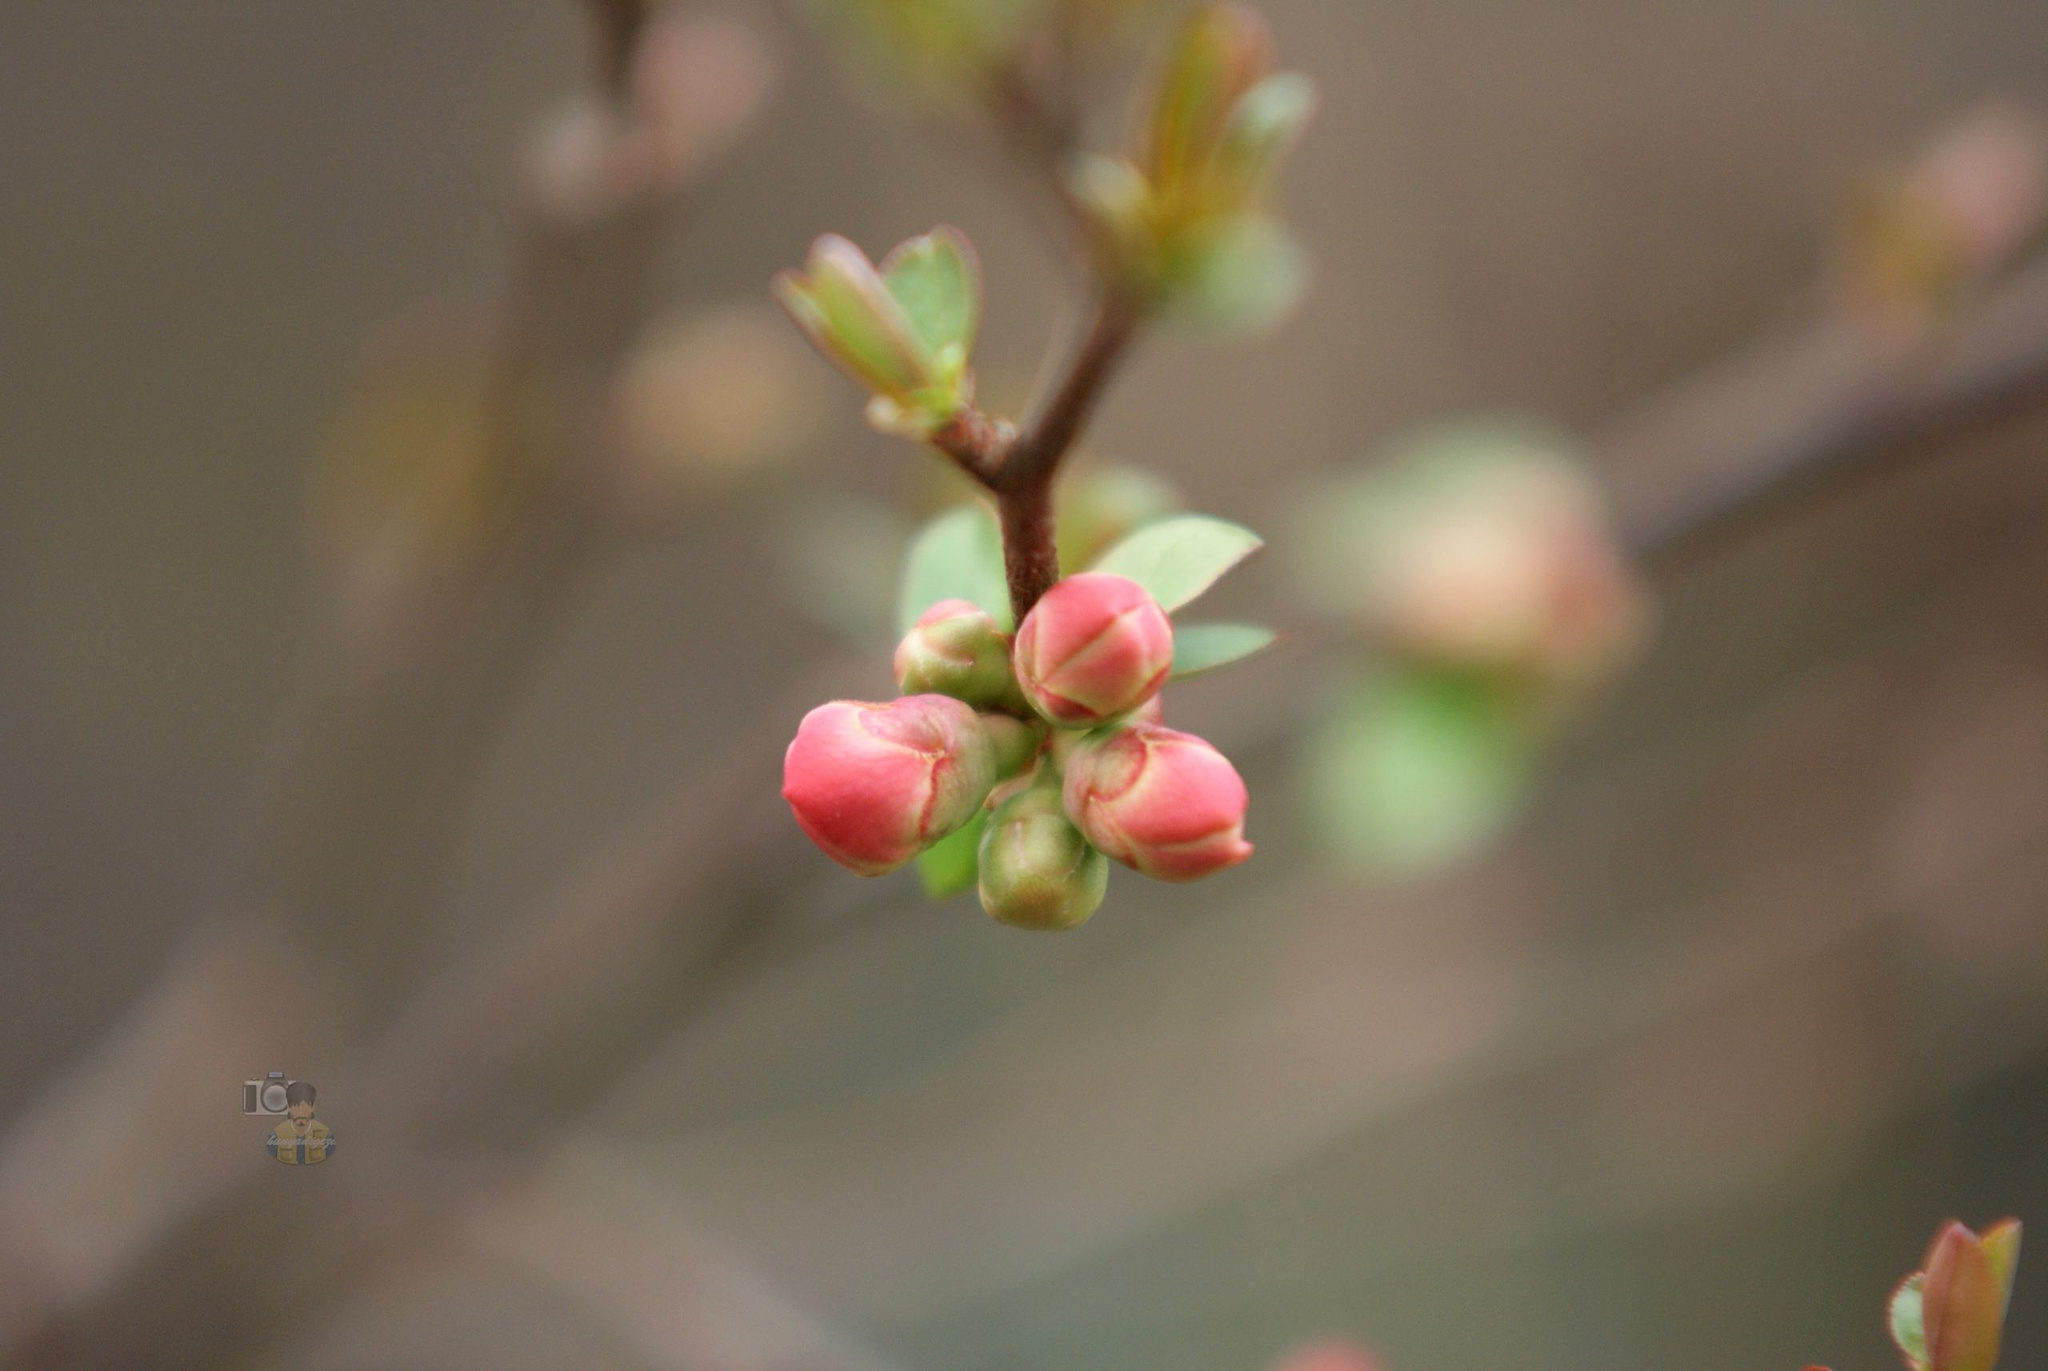 28.02.16. flower bud by hunyadigeza